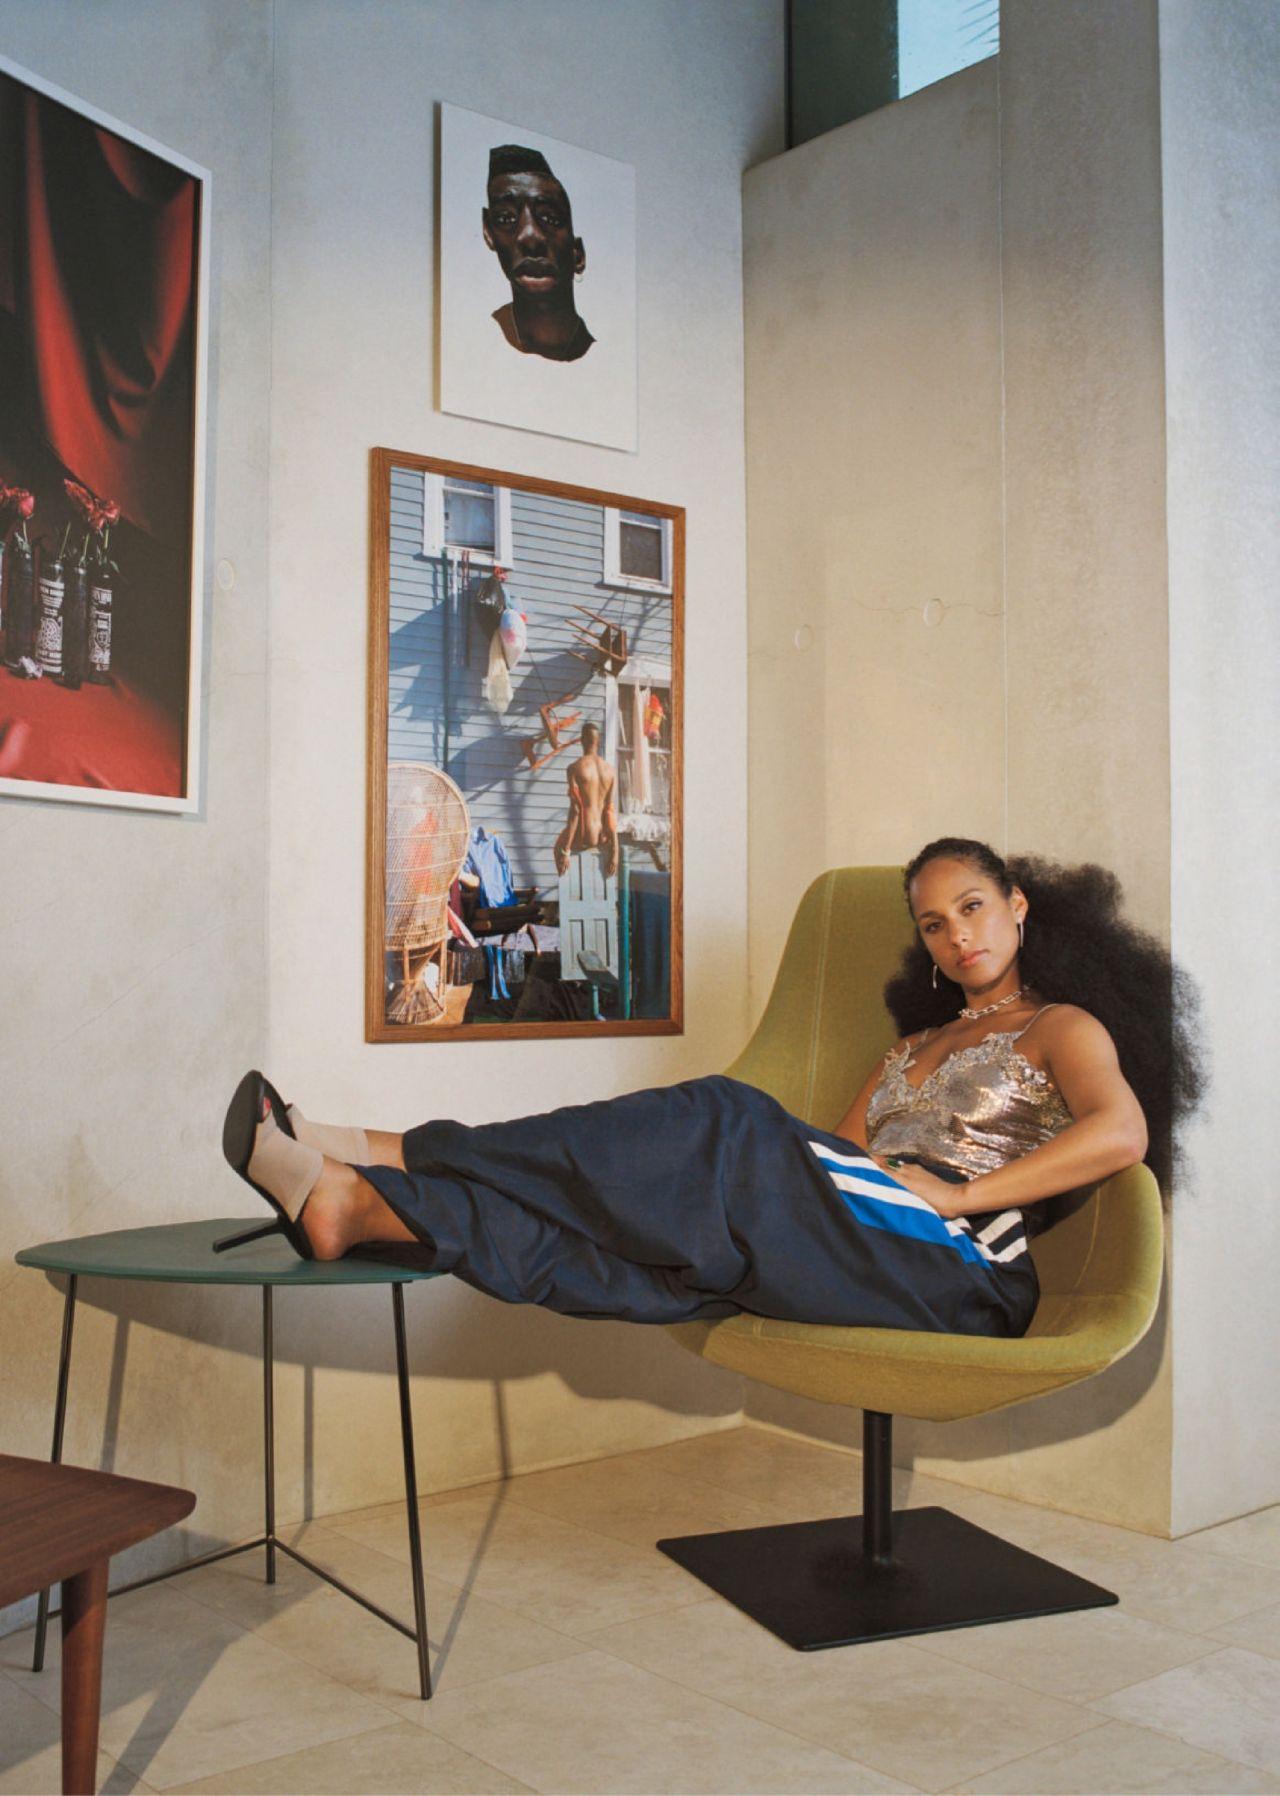 Alicia Keys Allure 2021 3 - Фото: Алиша Киз на обложке Allure